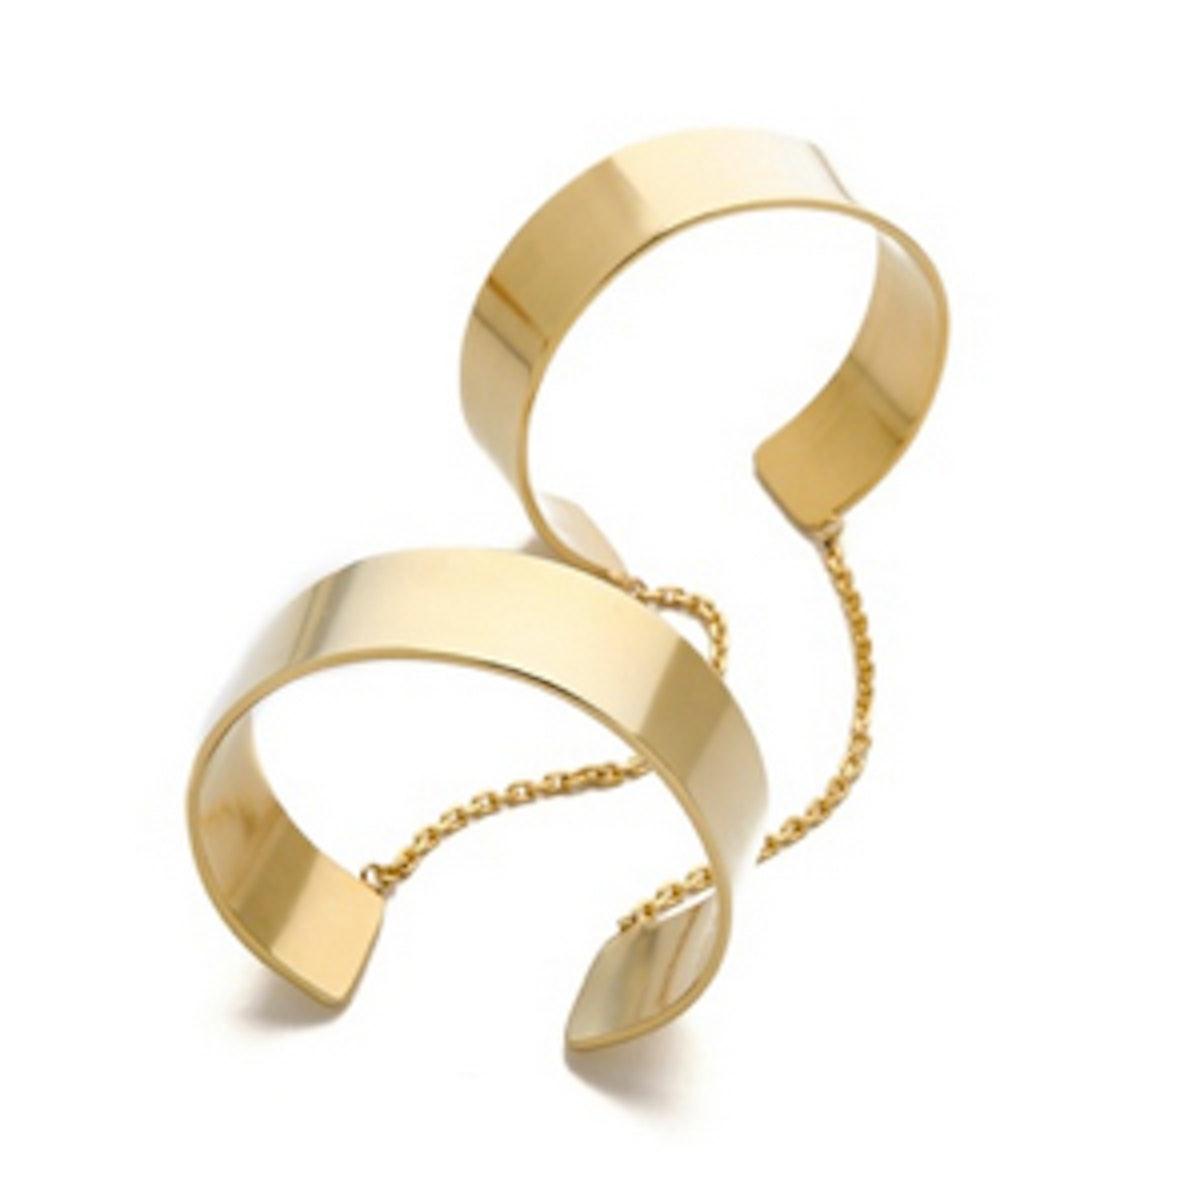 Anarchy Double Cuff Bracelet